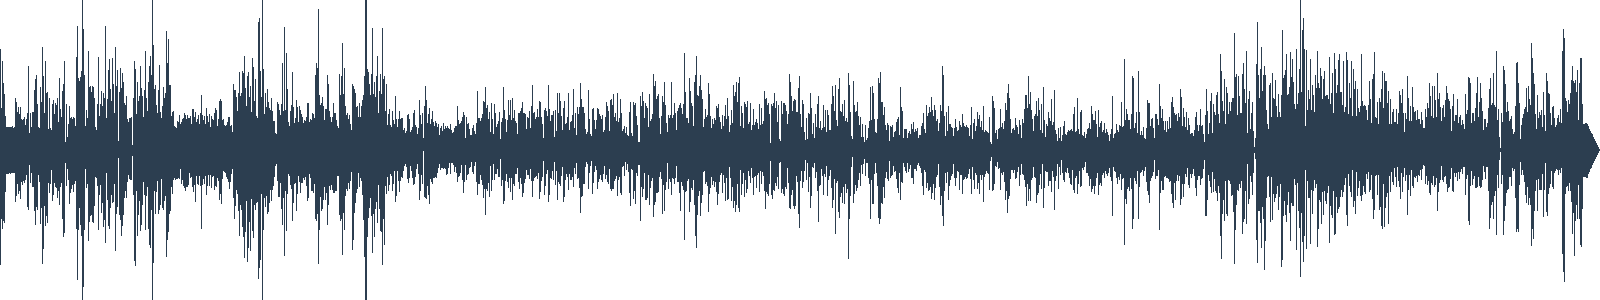 Speciál - Co posloucháme #36 waveform